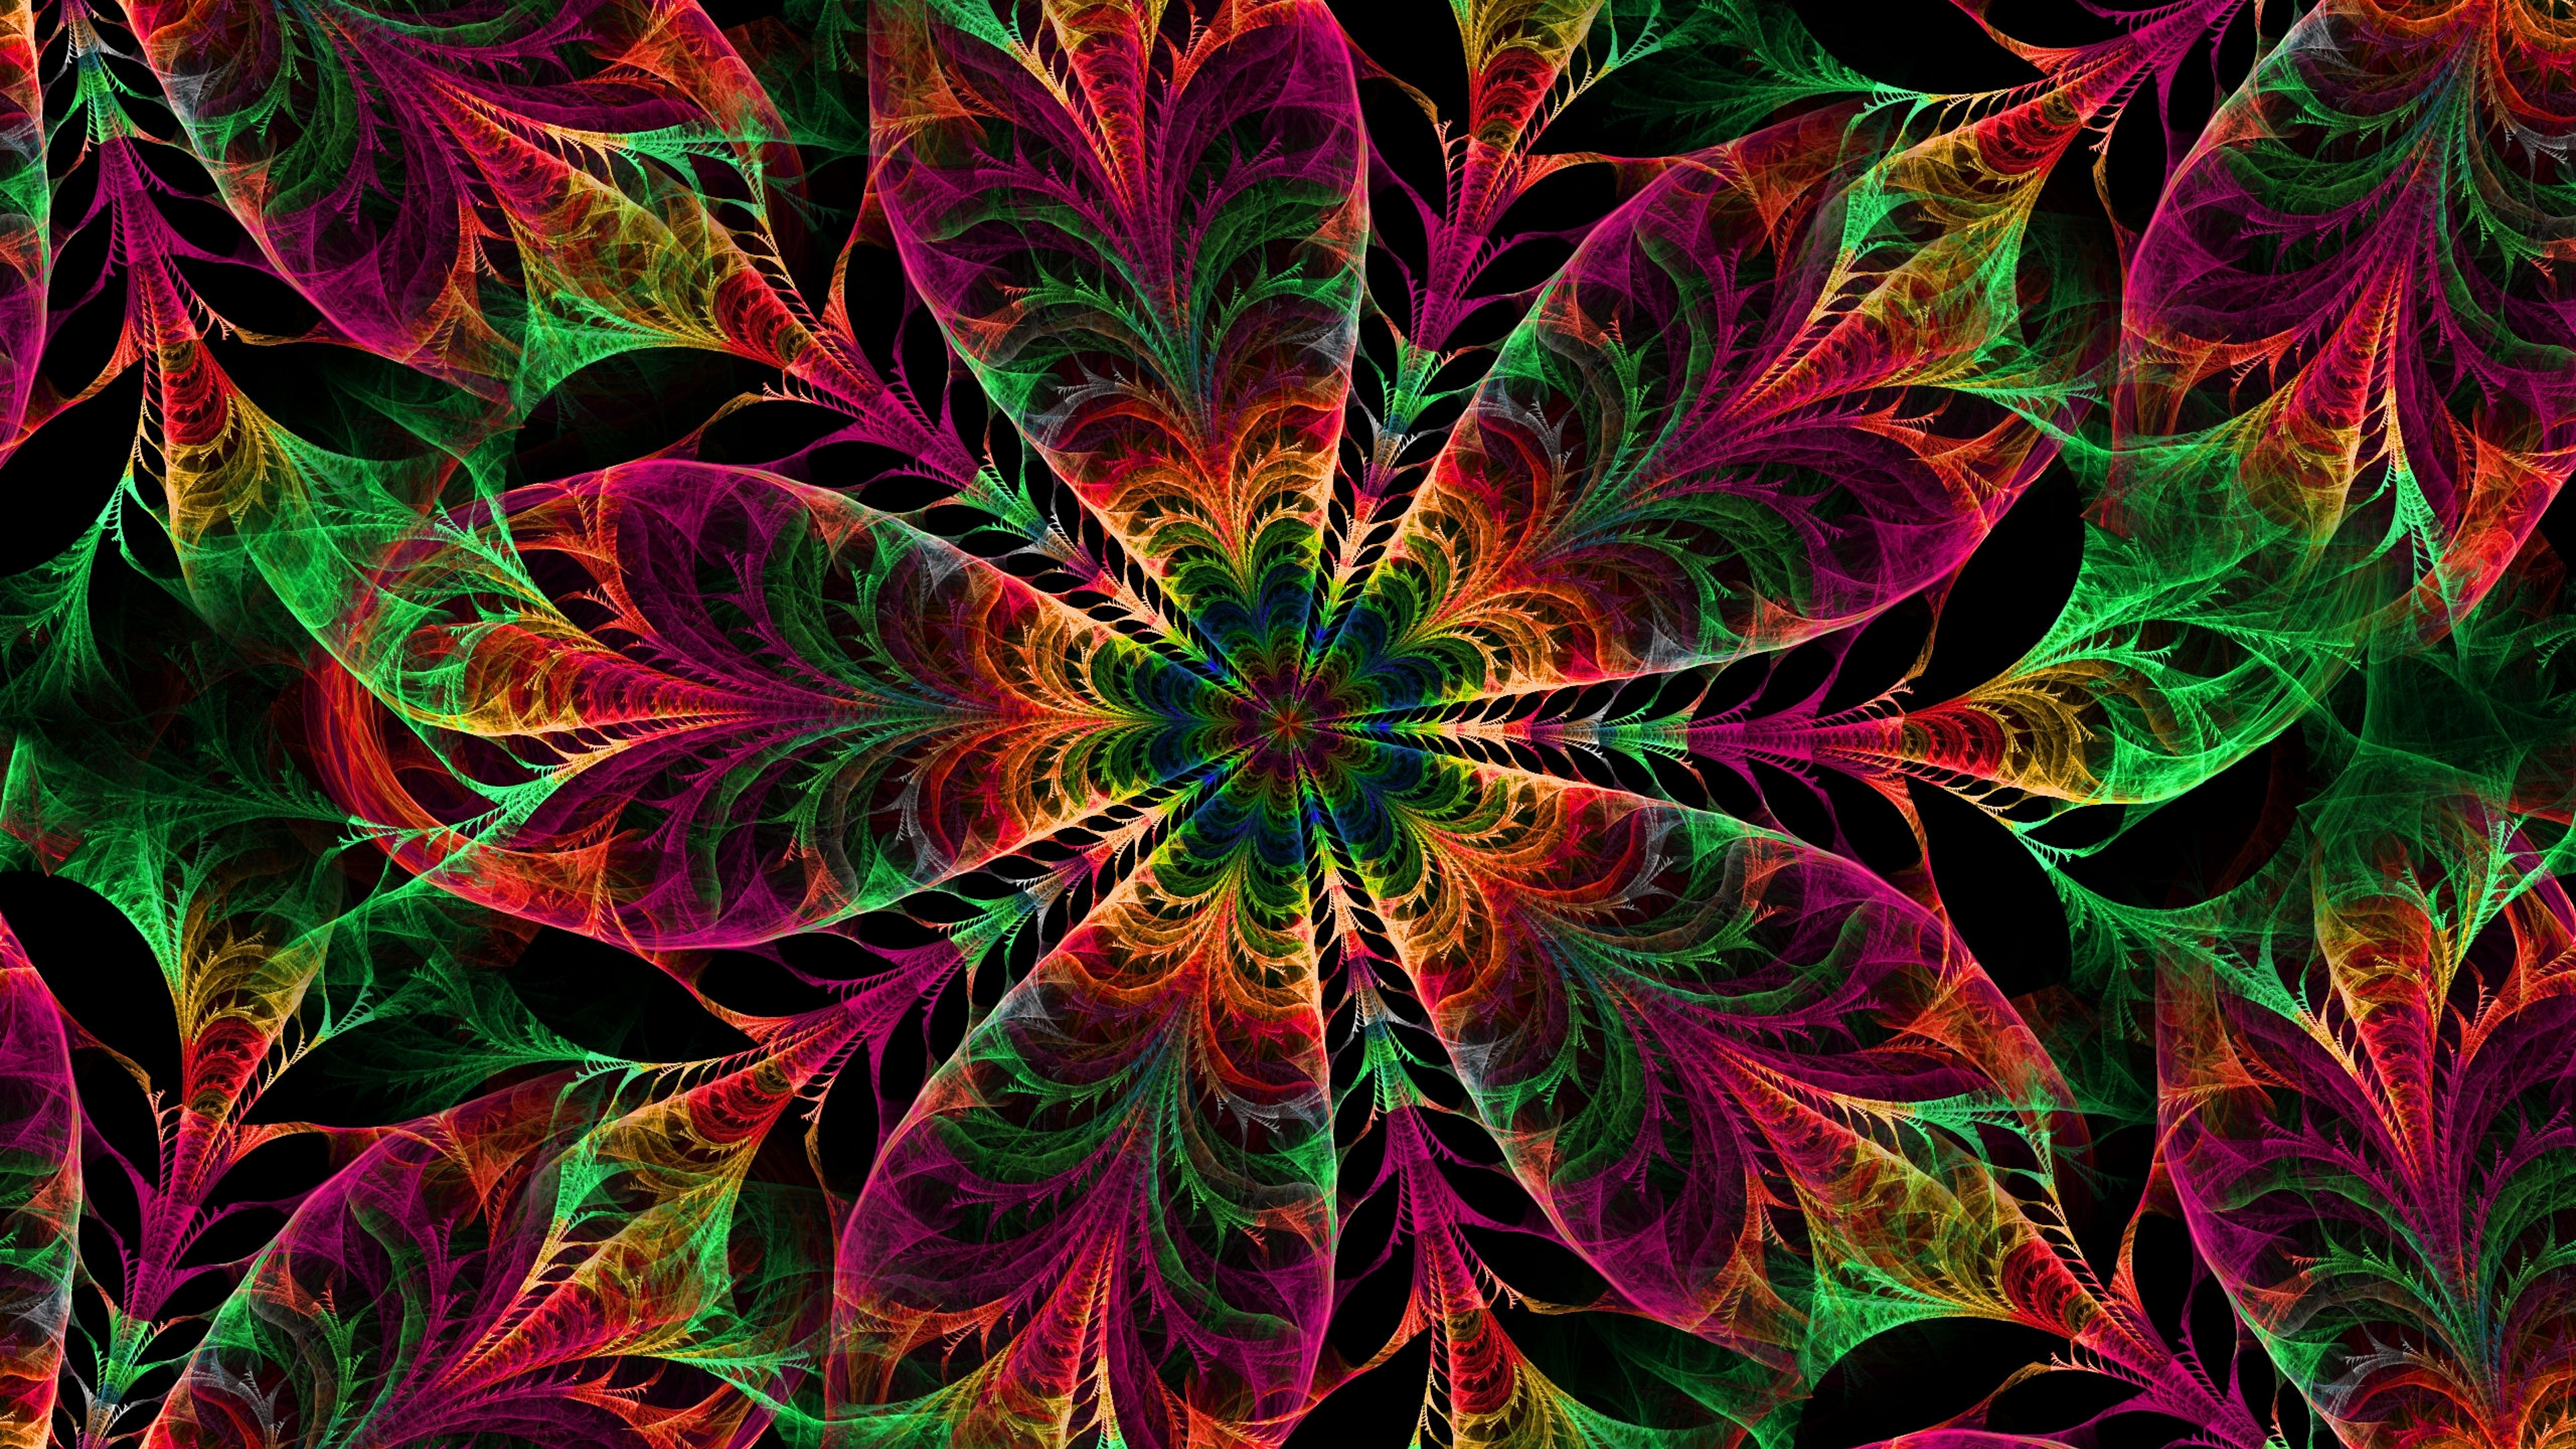 kaleidoscope patterns colors 4k 1539370559 - kaleidoscope, patterns, colors 4k - patterns, kaleidoscope, Colors